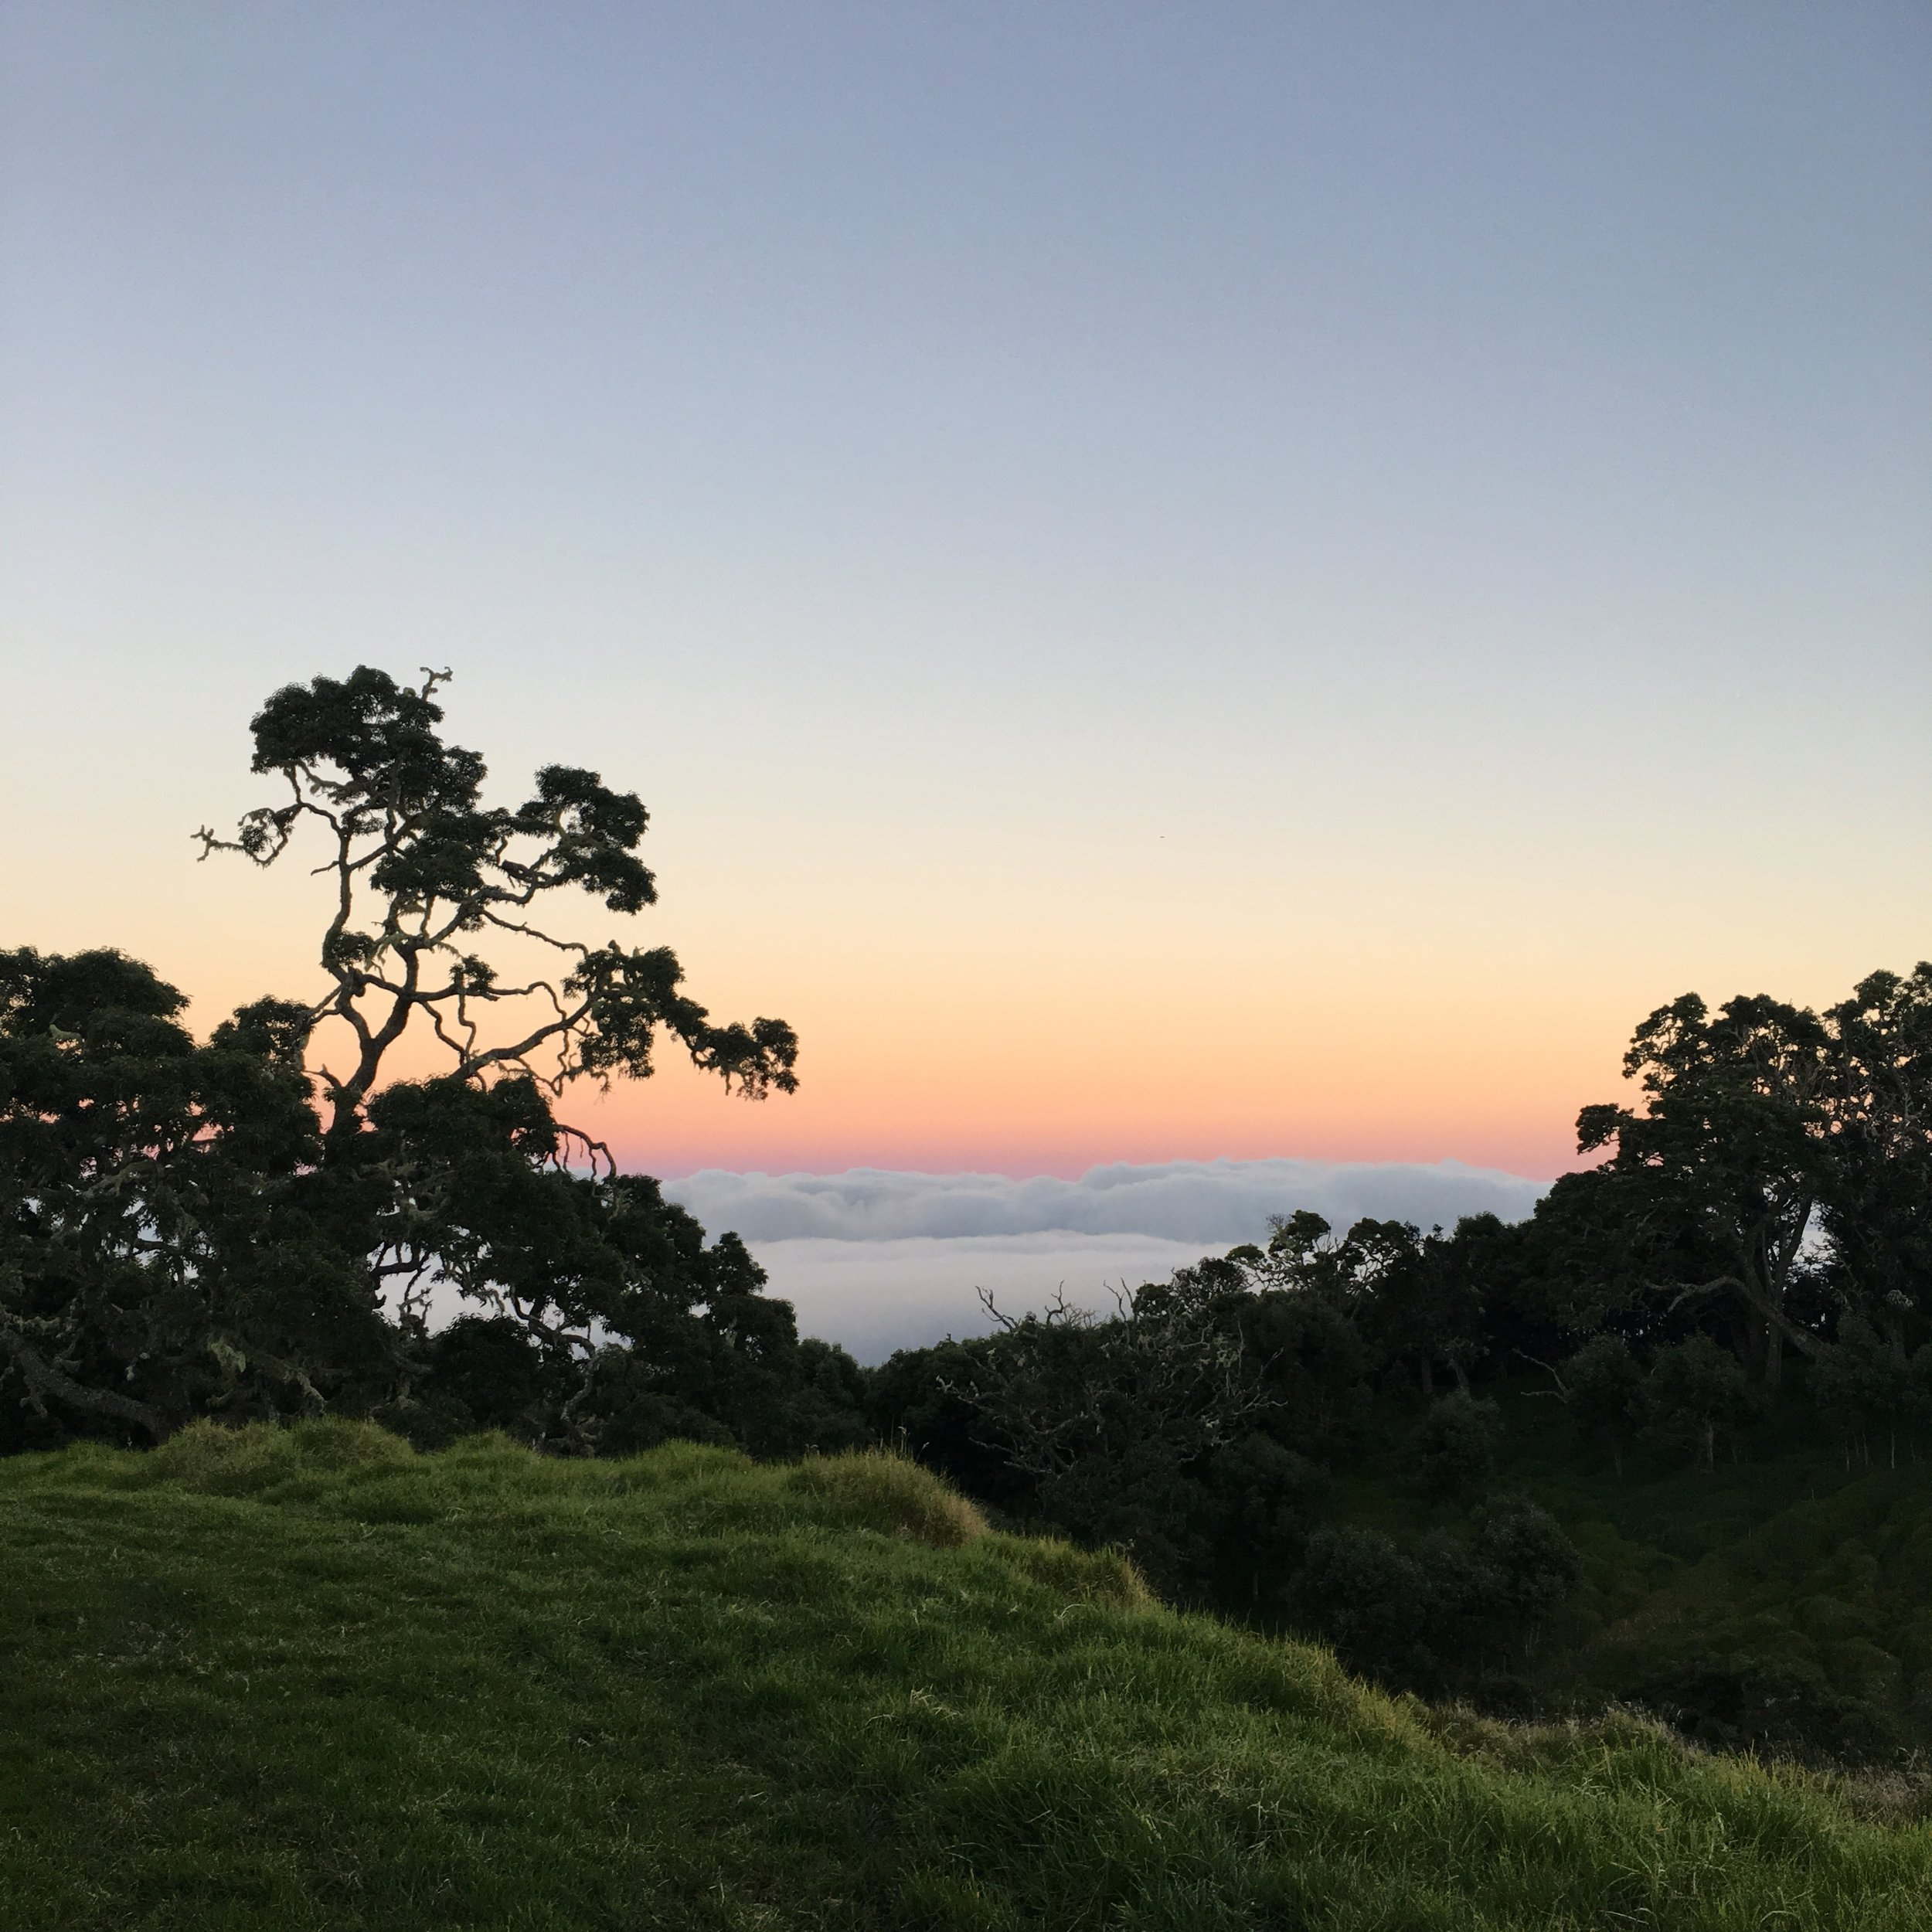 Sunset on Mauna Kea in the Koa forest on Big Island, Hawaii.